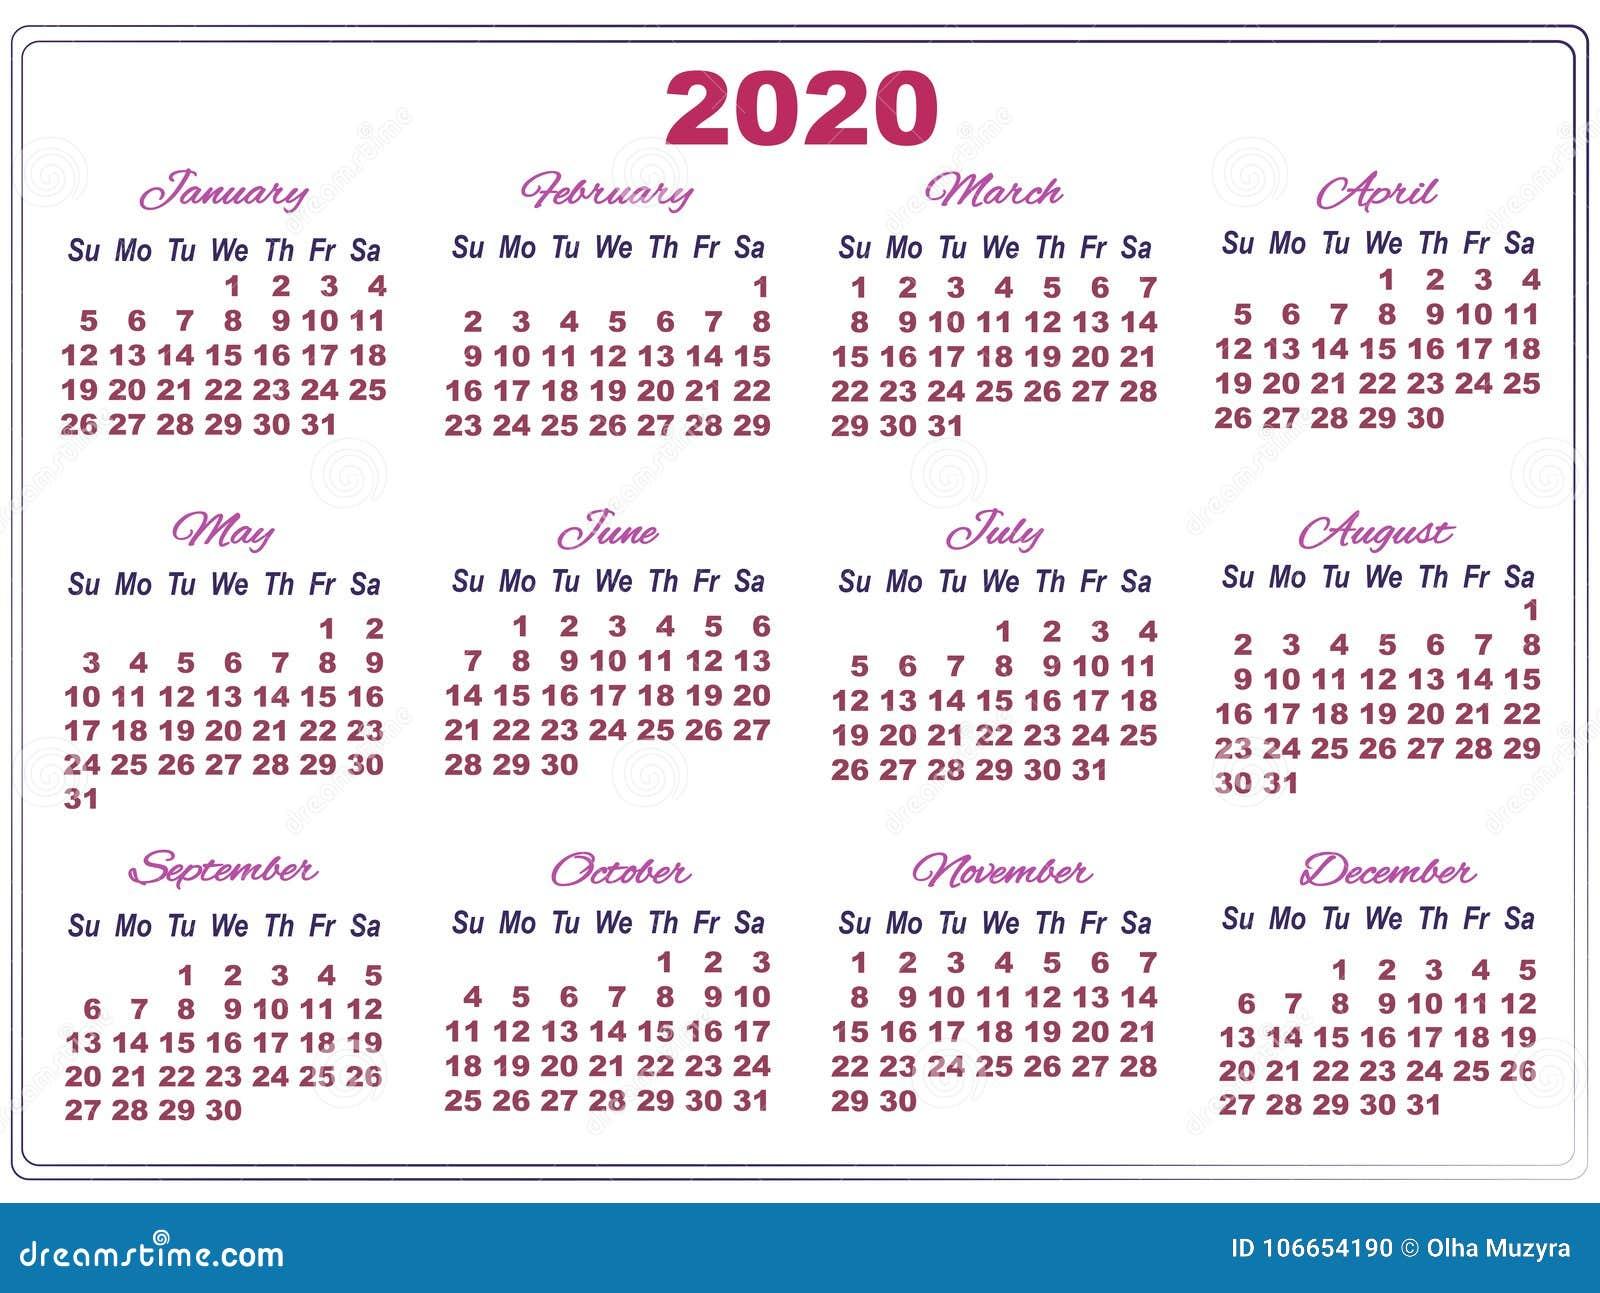 Big February 2020 Calendar 2020 Calendar With Big Numbers Stock Illustration   Illustration